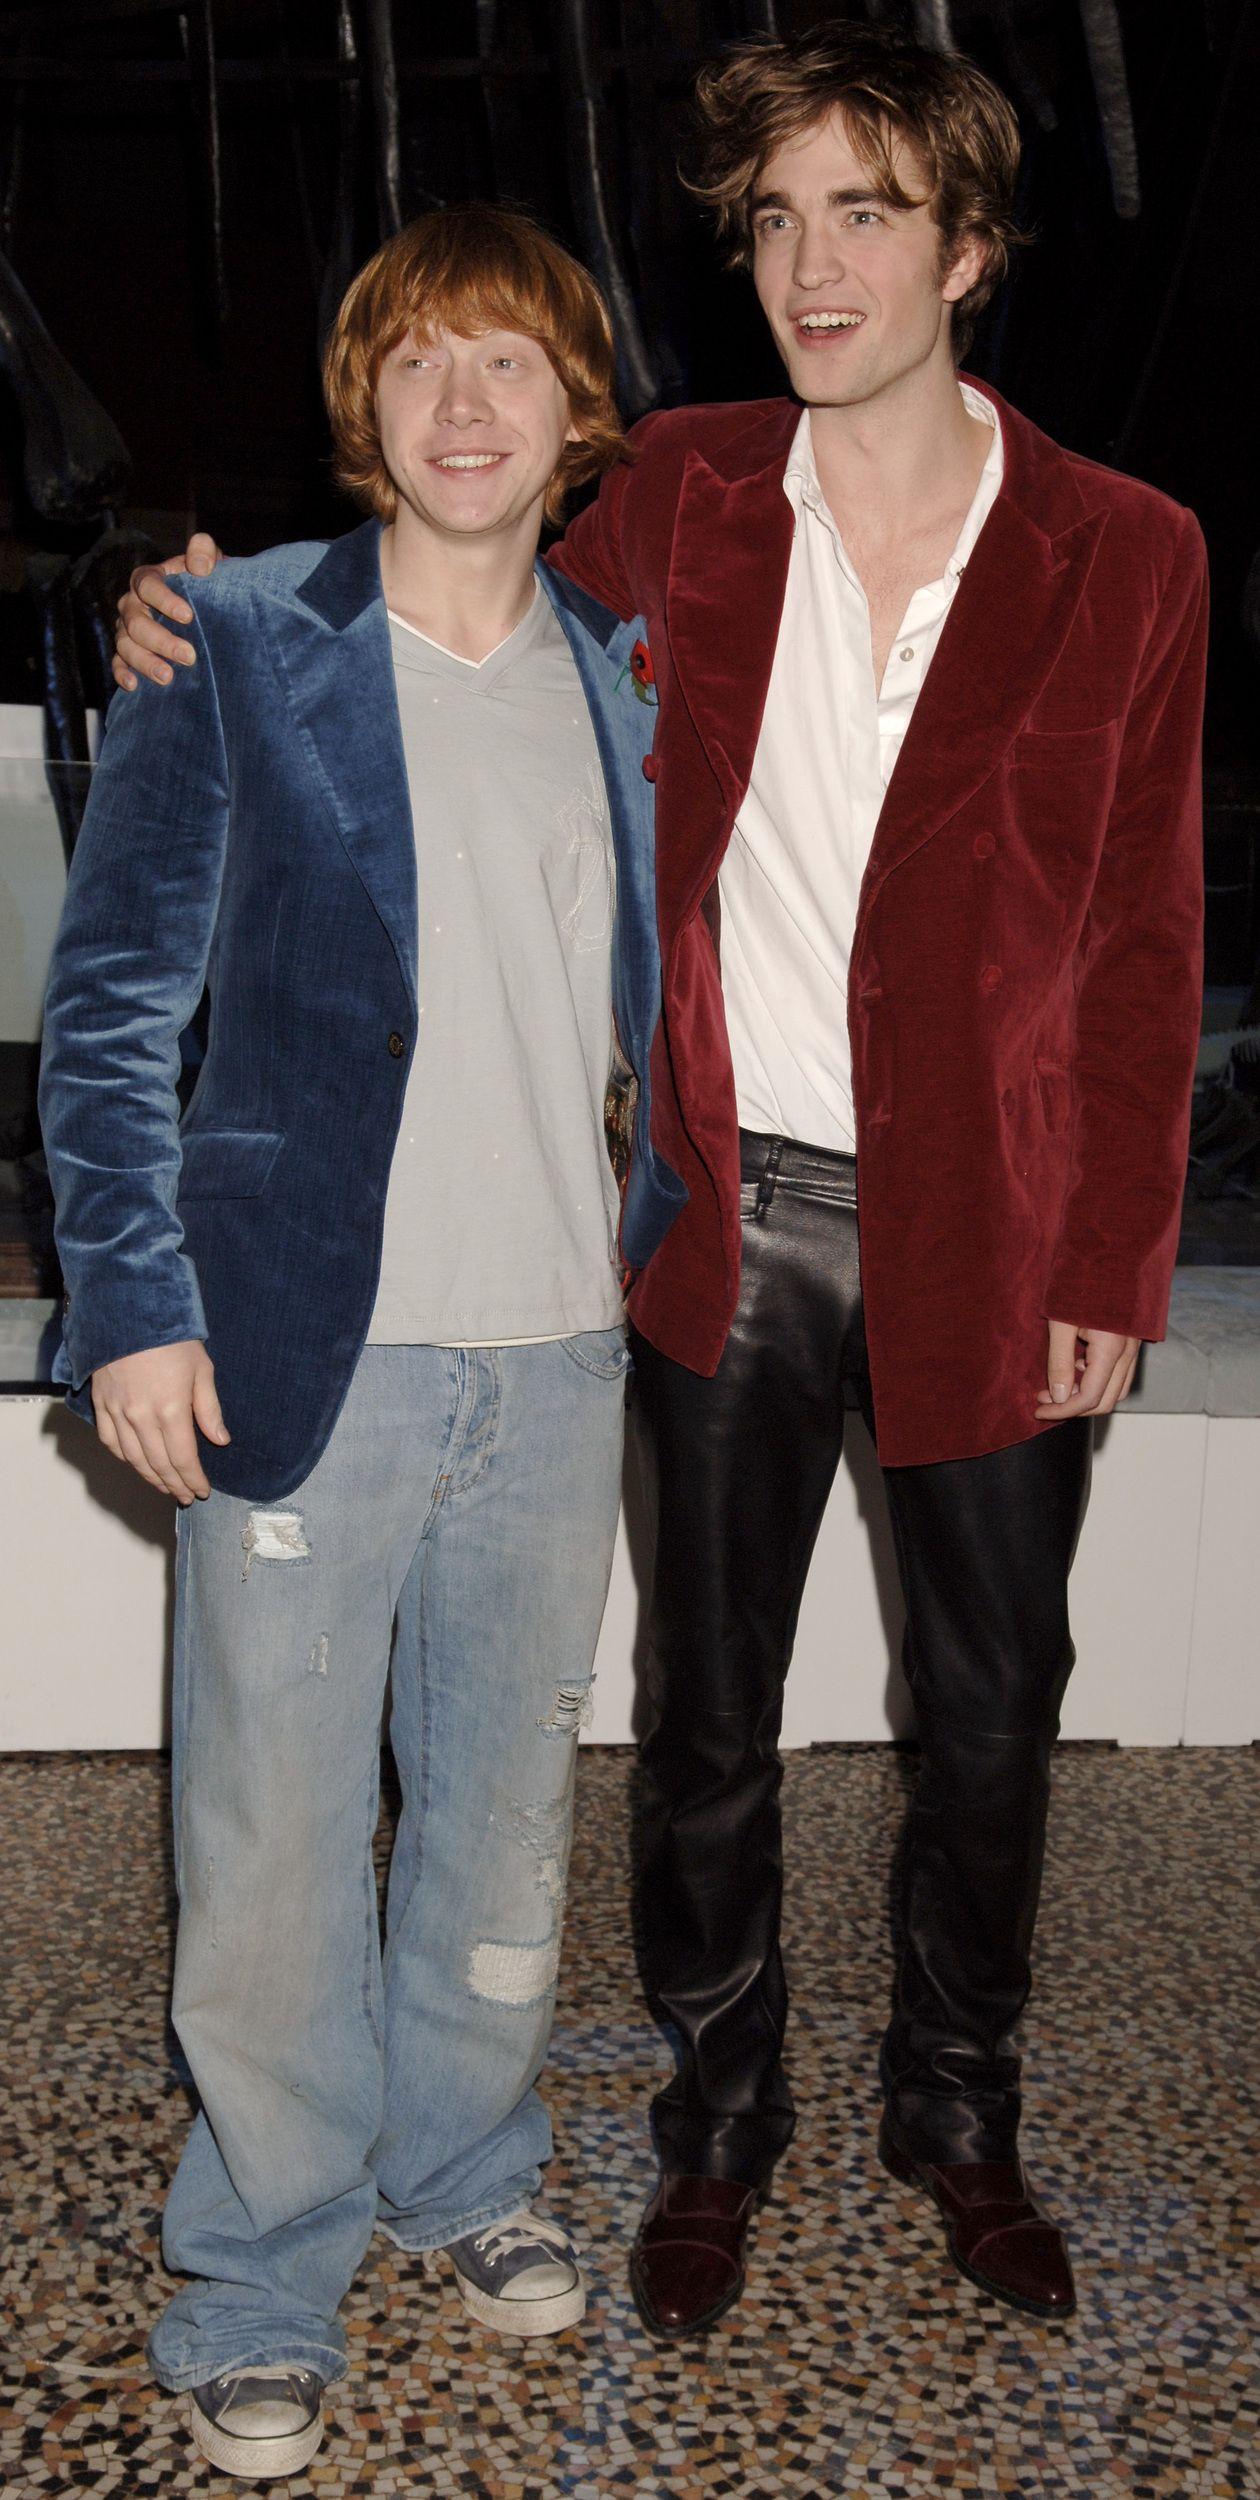 Harry Potter star Rupert Grint becomes a father